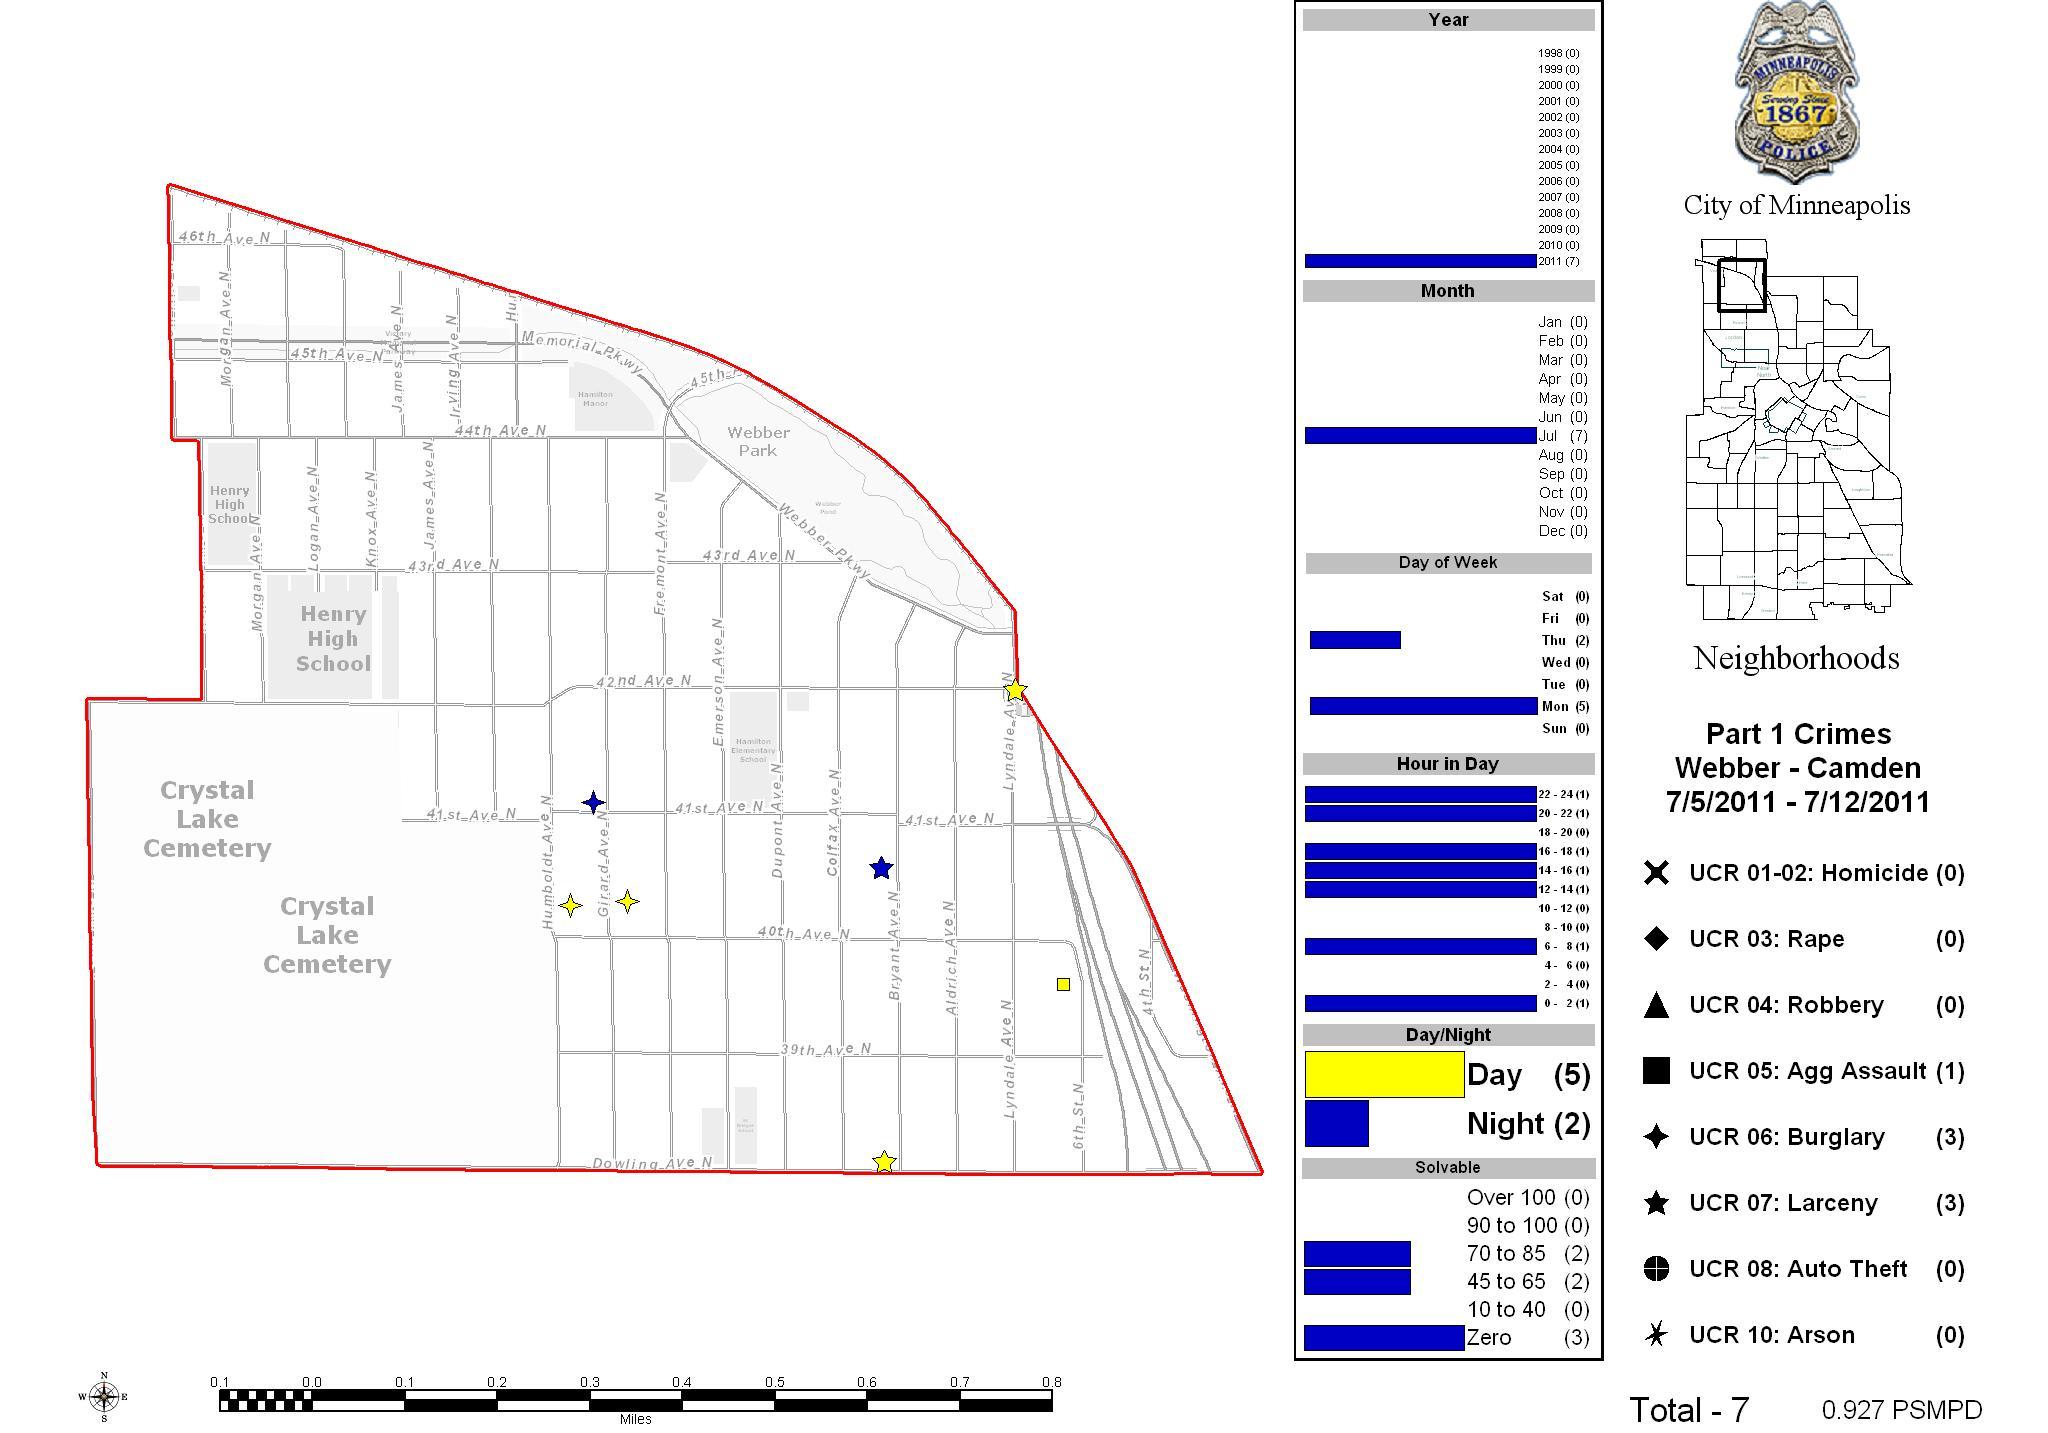 Minneapolis Police Precinct 4 (Sector 3) Update/Webber-Camden Crime Map